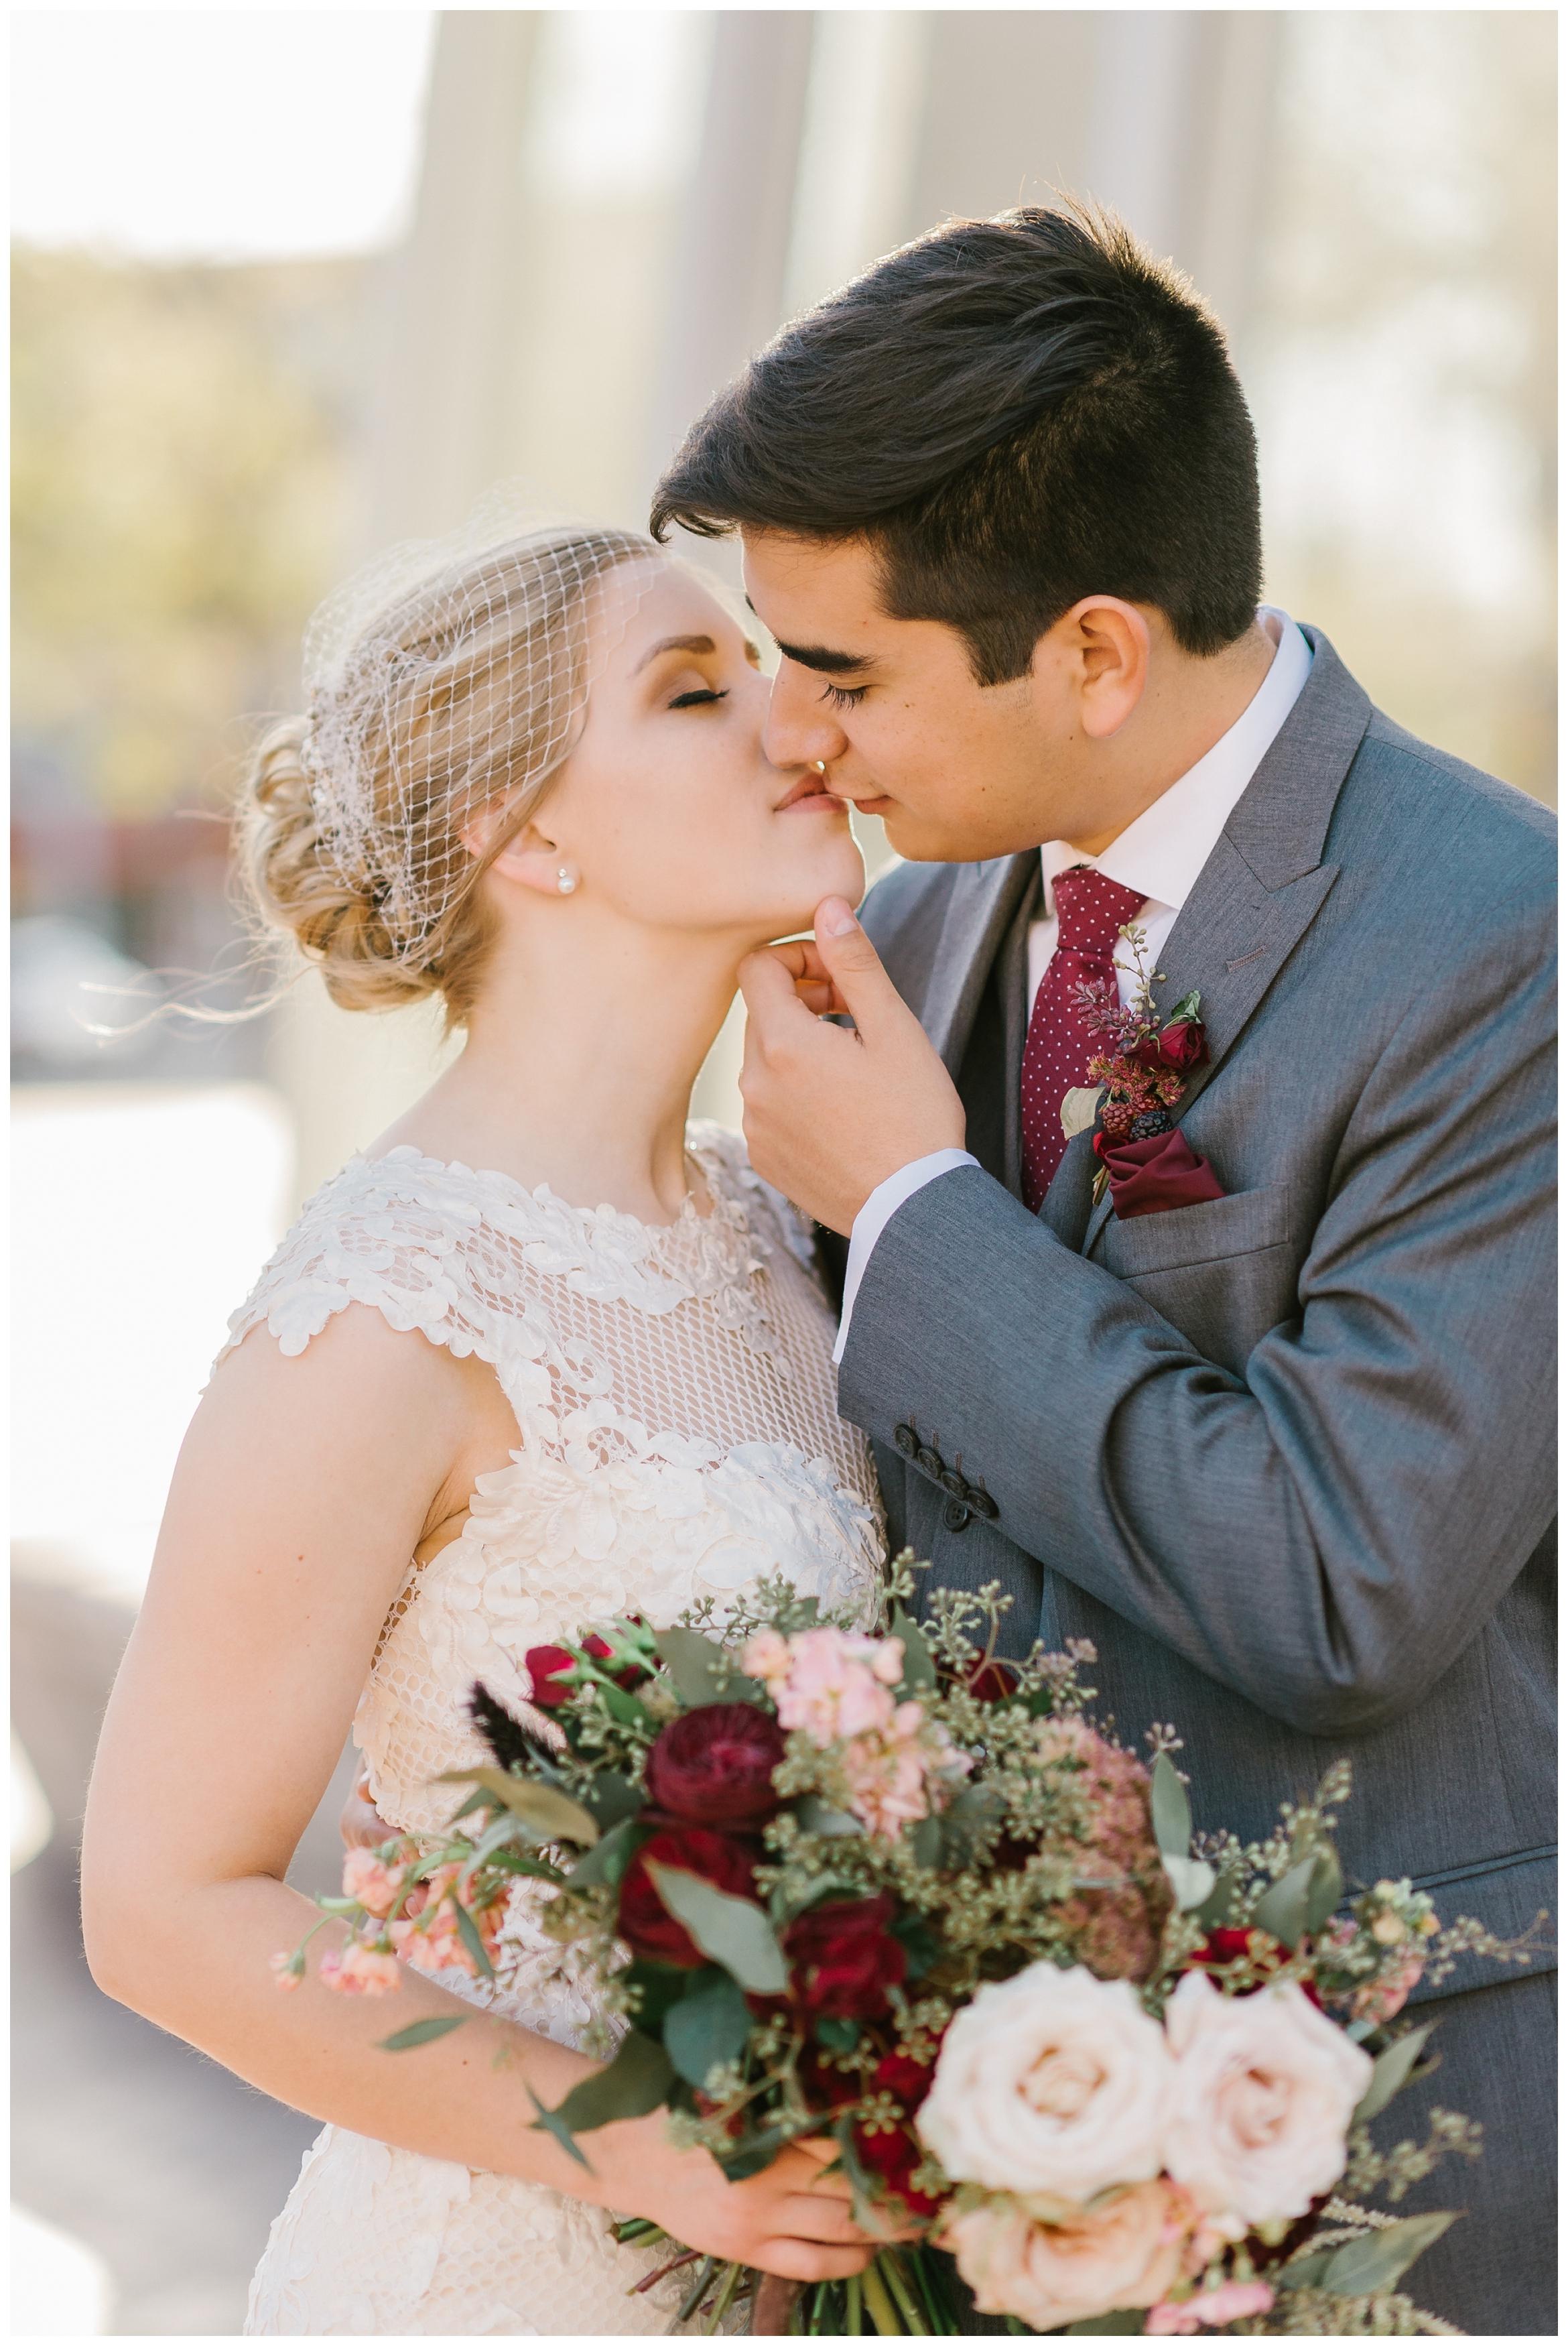 Rebecca_Shehorn_Photography_Indianapolis_Wedding_Photographer_7367.jpg